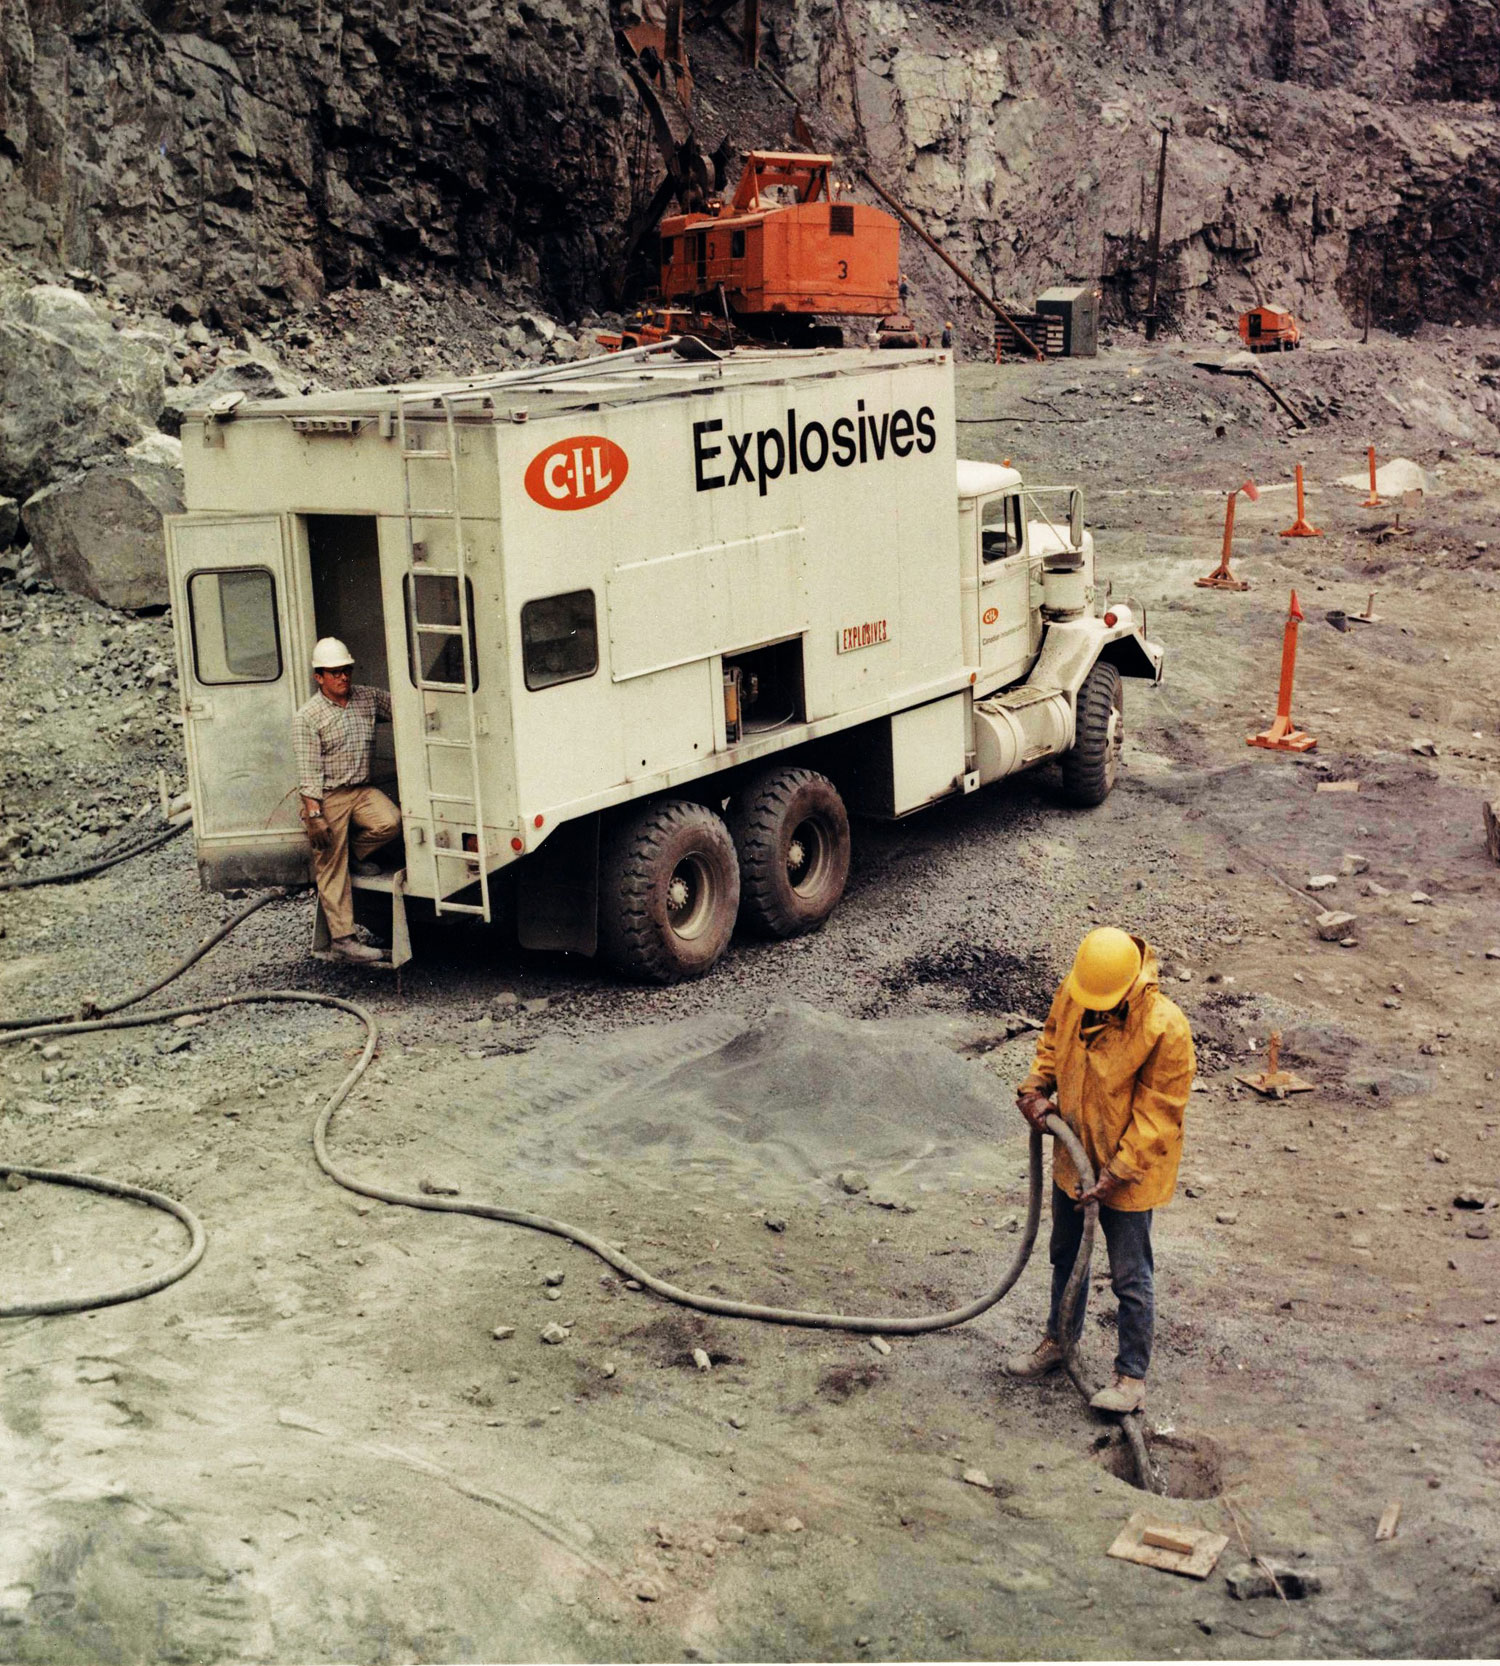 Marmoraton Mine Explosives